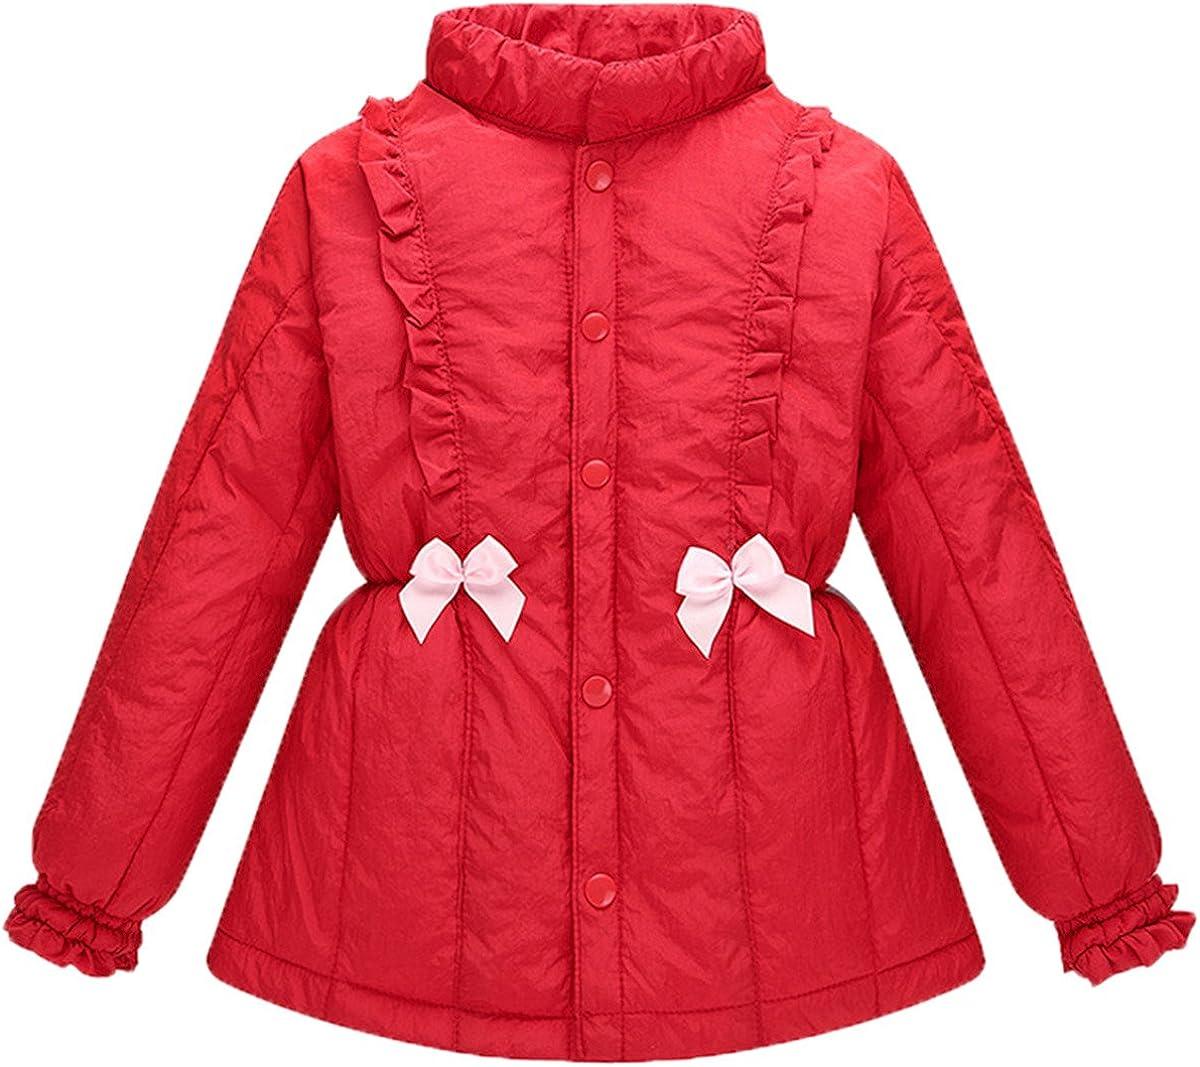 JELEUON Kids Baby GirlsWinter Bowknot Thicken Warm Down Puffer Jacket Outwear Coat